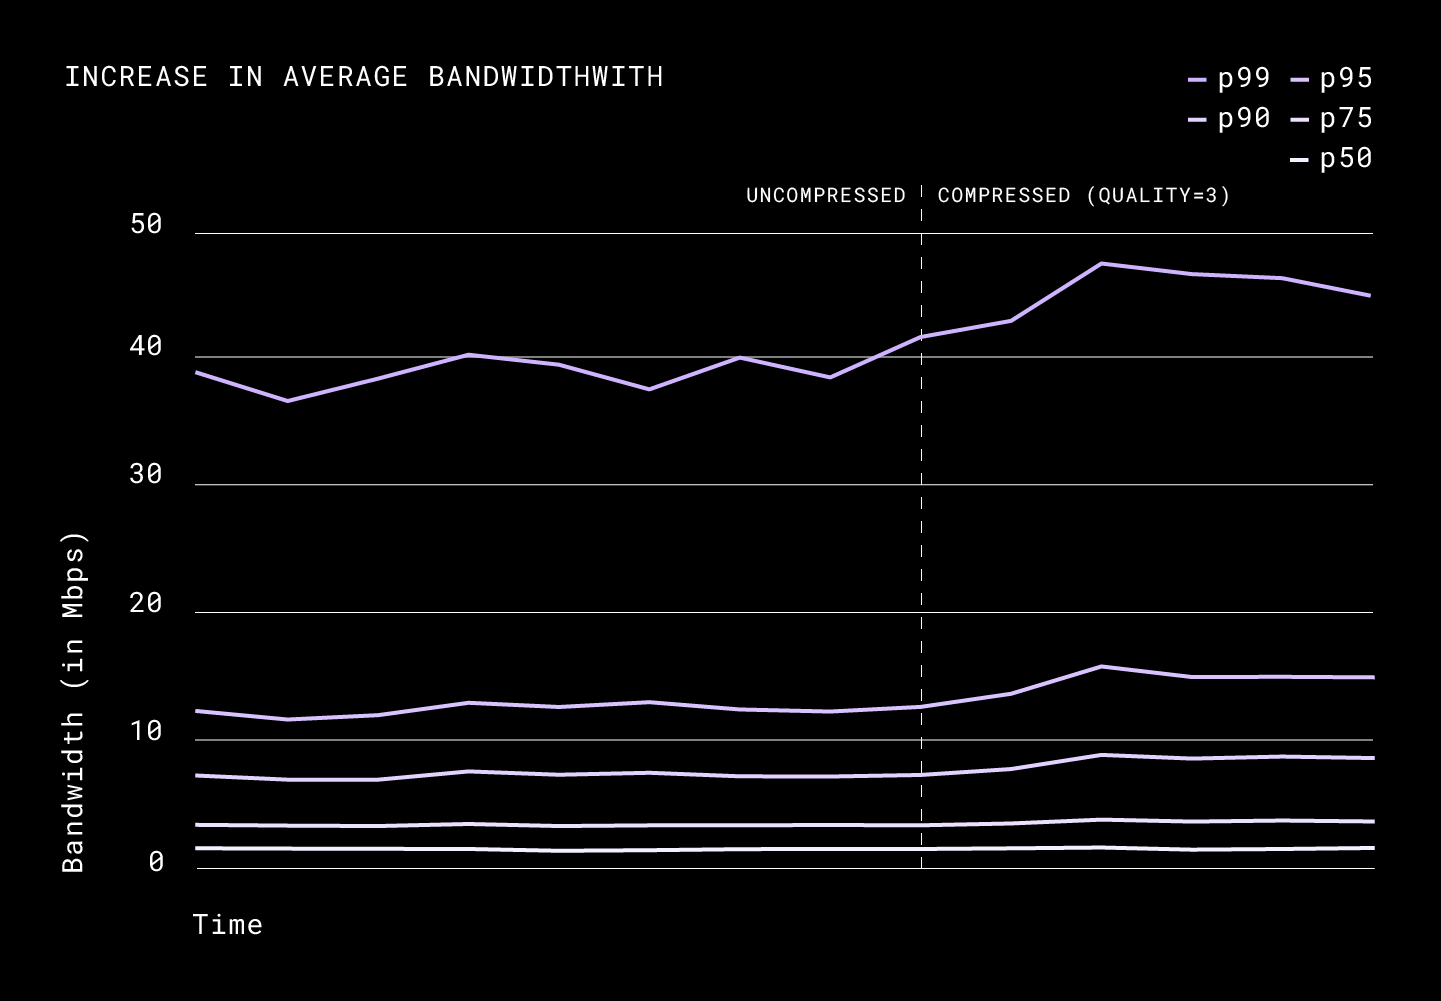 Increase in average download bandwidth